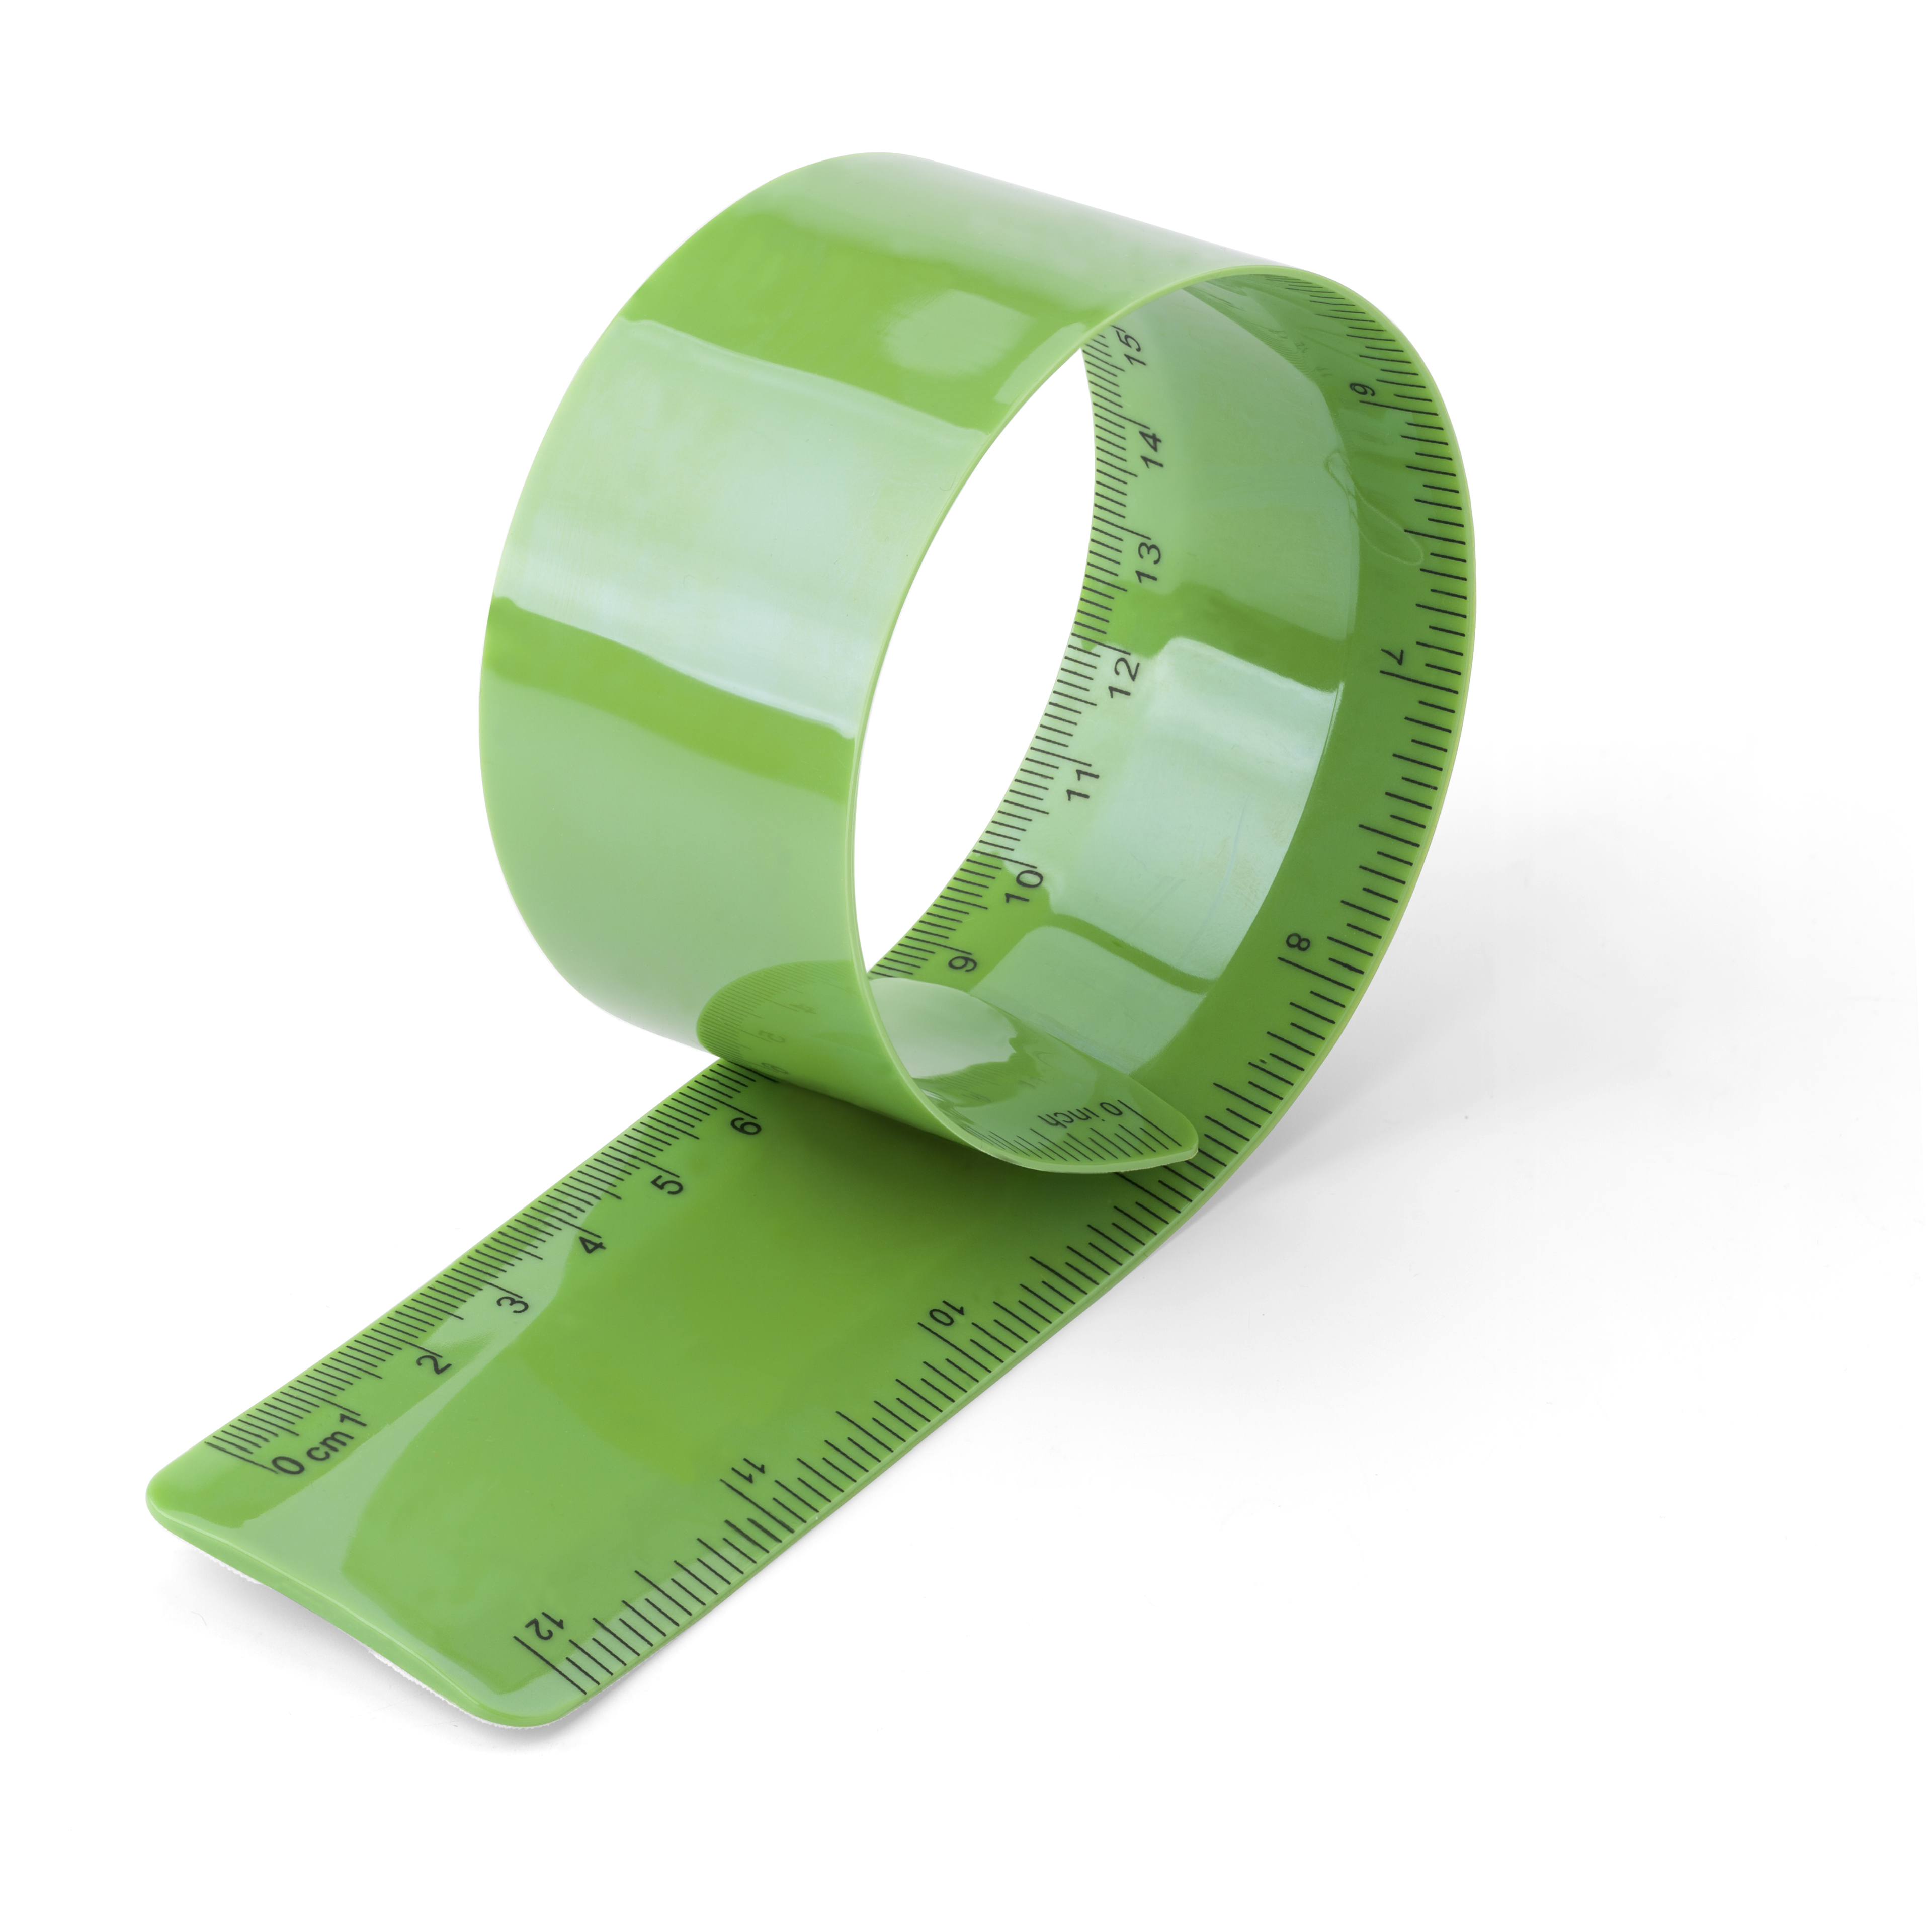 Promotional Flexible plastic ruler, 30cm/12